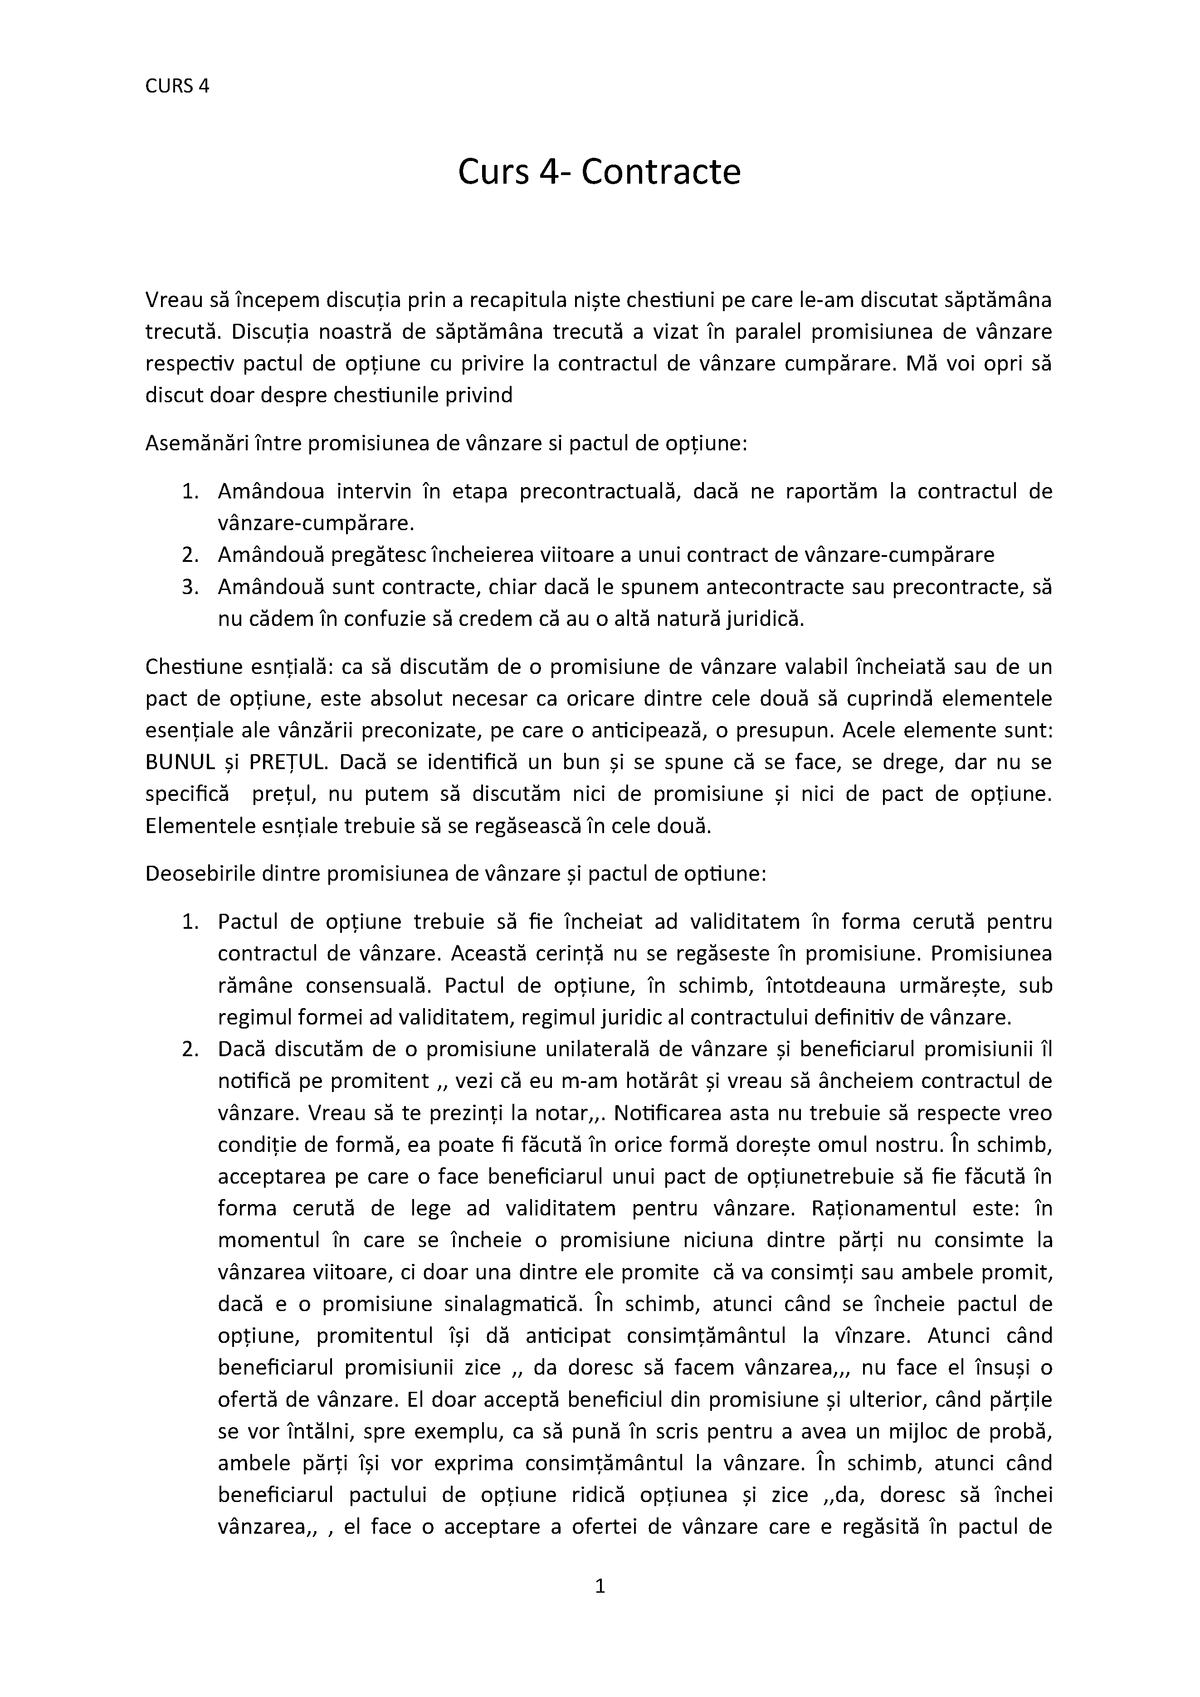 exemplu de opțiune de apel